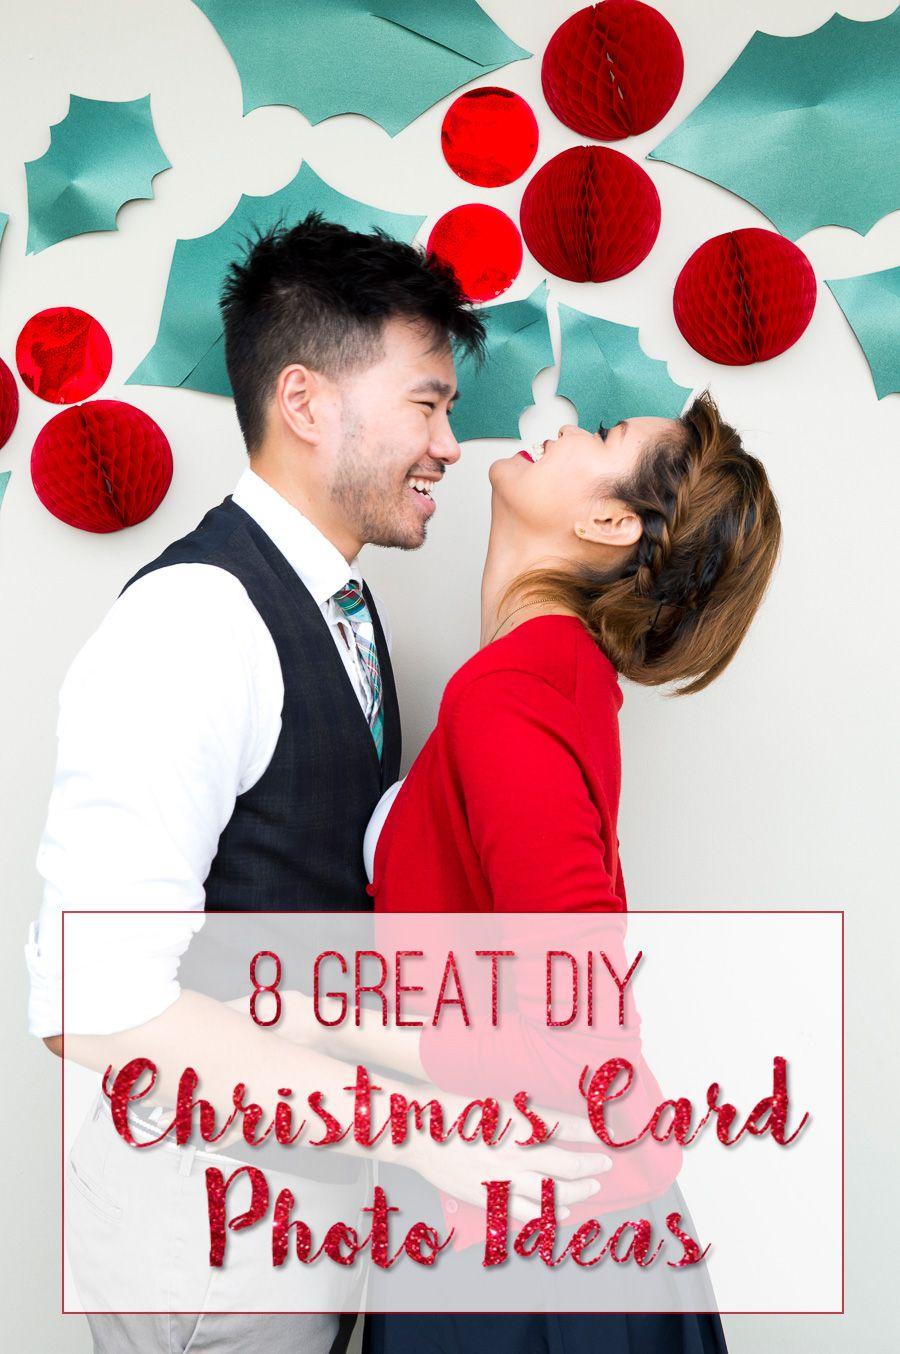 Snowplace Like Home Diy Christmas Card Photo Ideas For Couples Diy Photo Christmas Cards Creative Christmas Cards Christmas Photo Cards